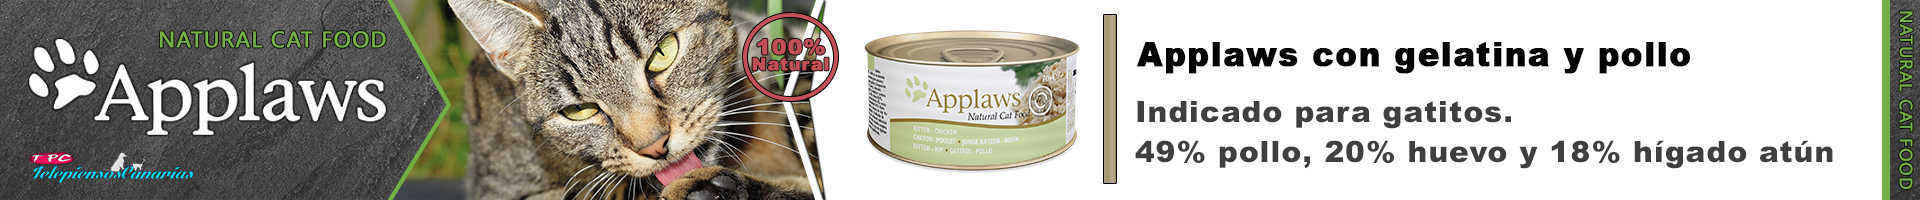 Applaws lata y gelatina de pollo para gatitos con pechuga de pollo 49%